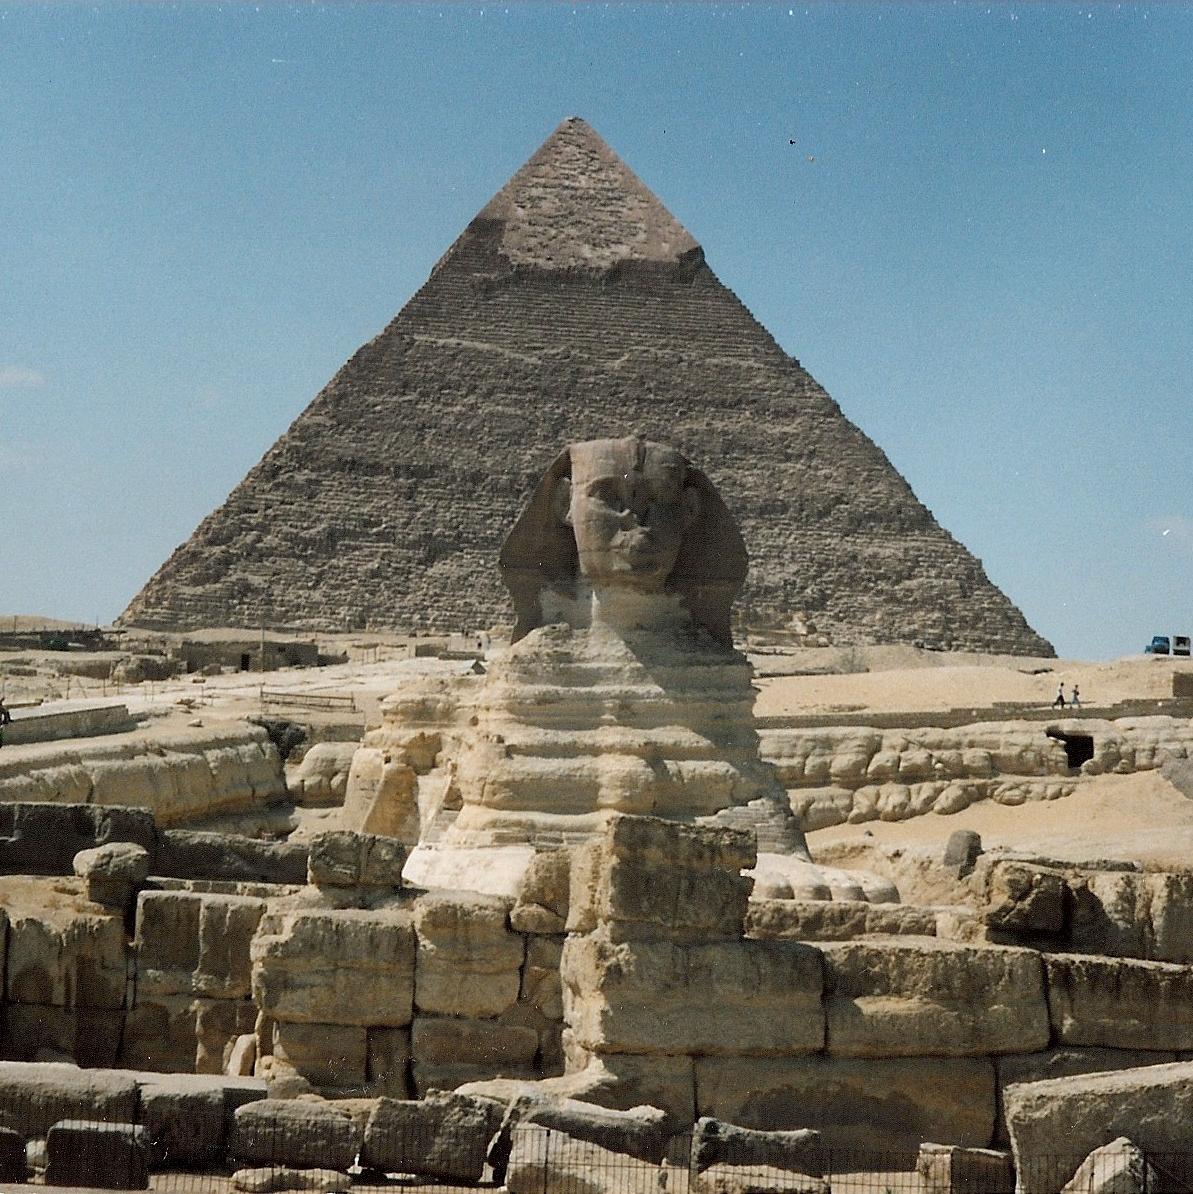 1991: North Africa - EGYPT, SINAI PENINSULA, MOROCCO, TUNISIA, ALGERIA